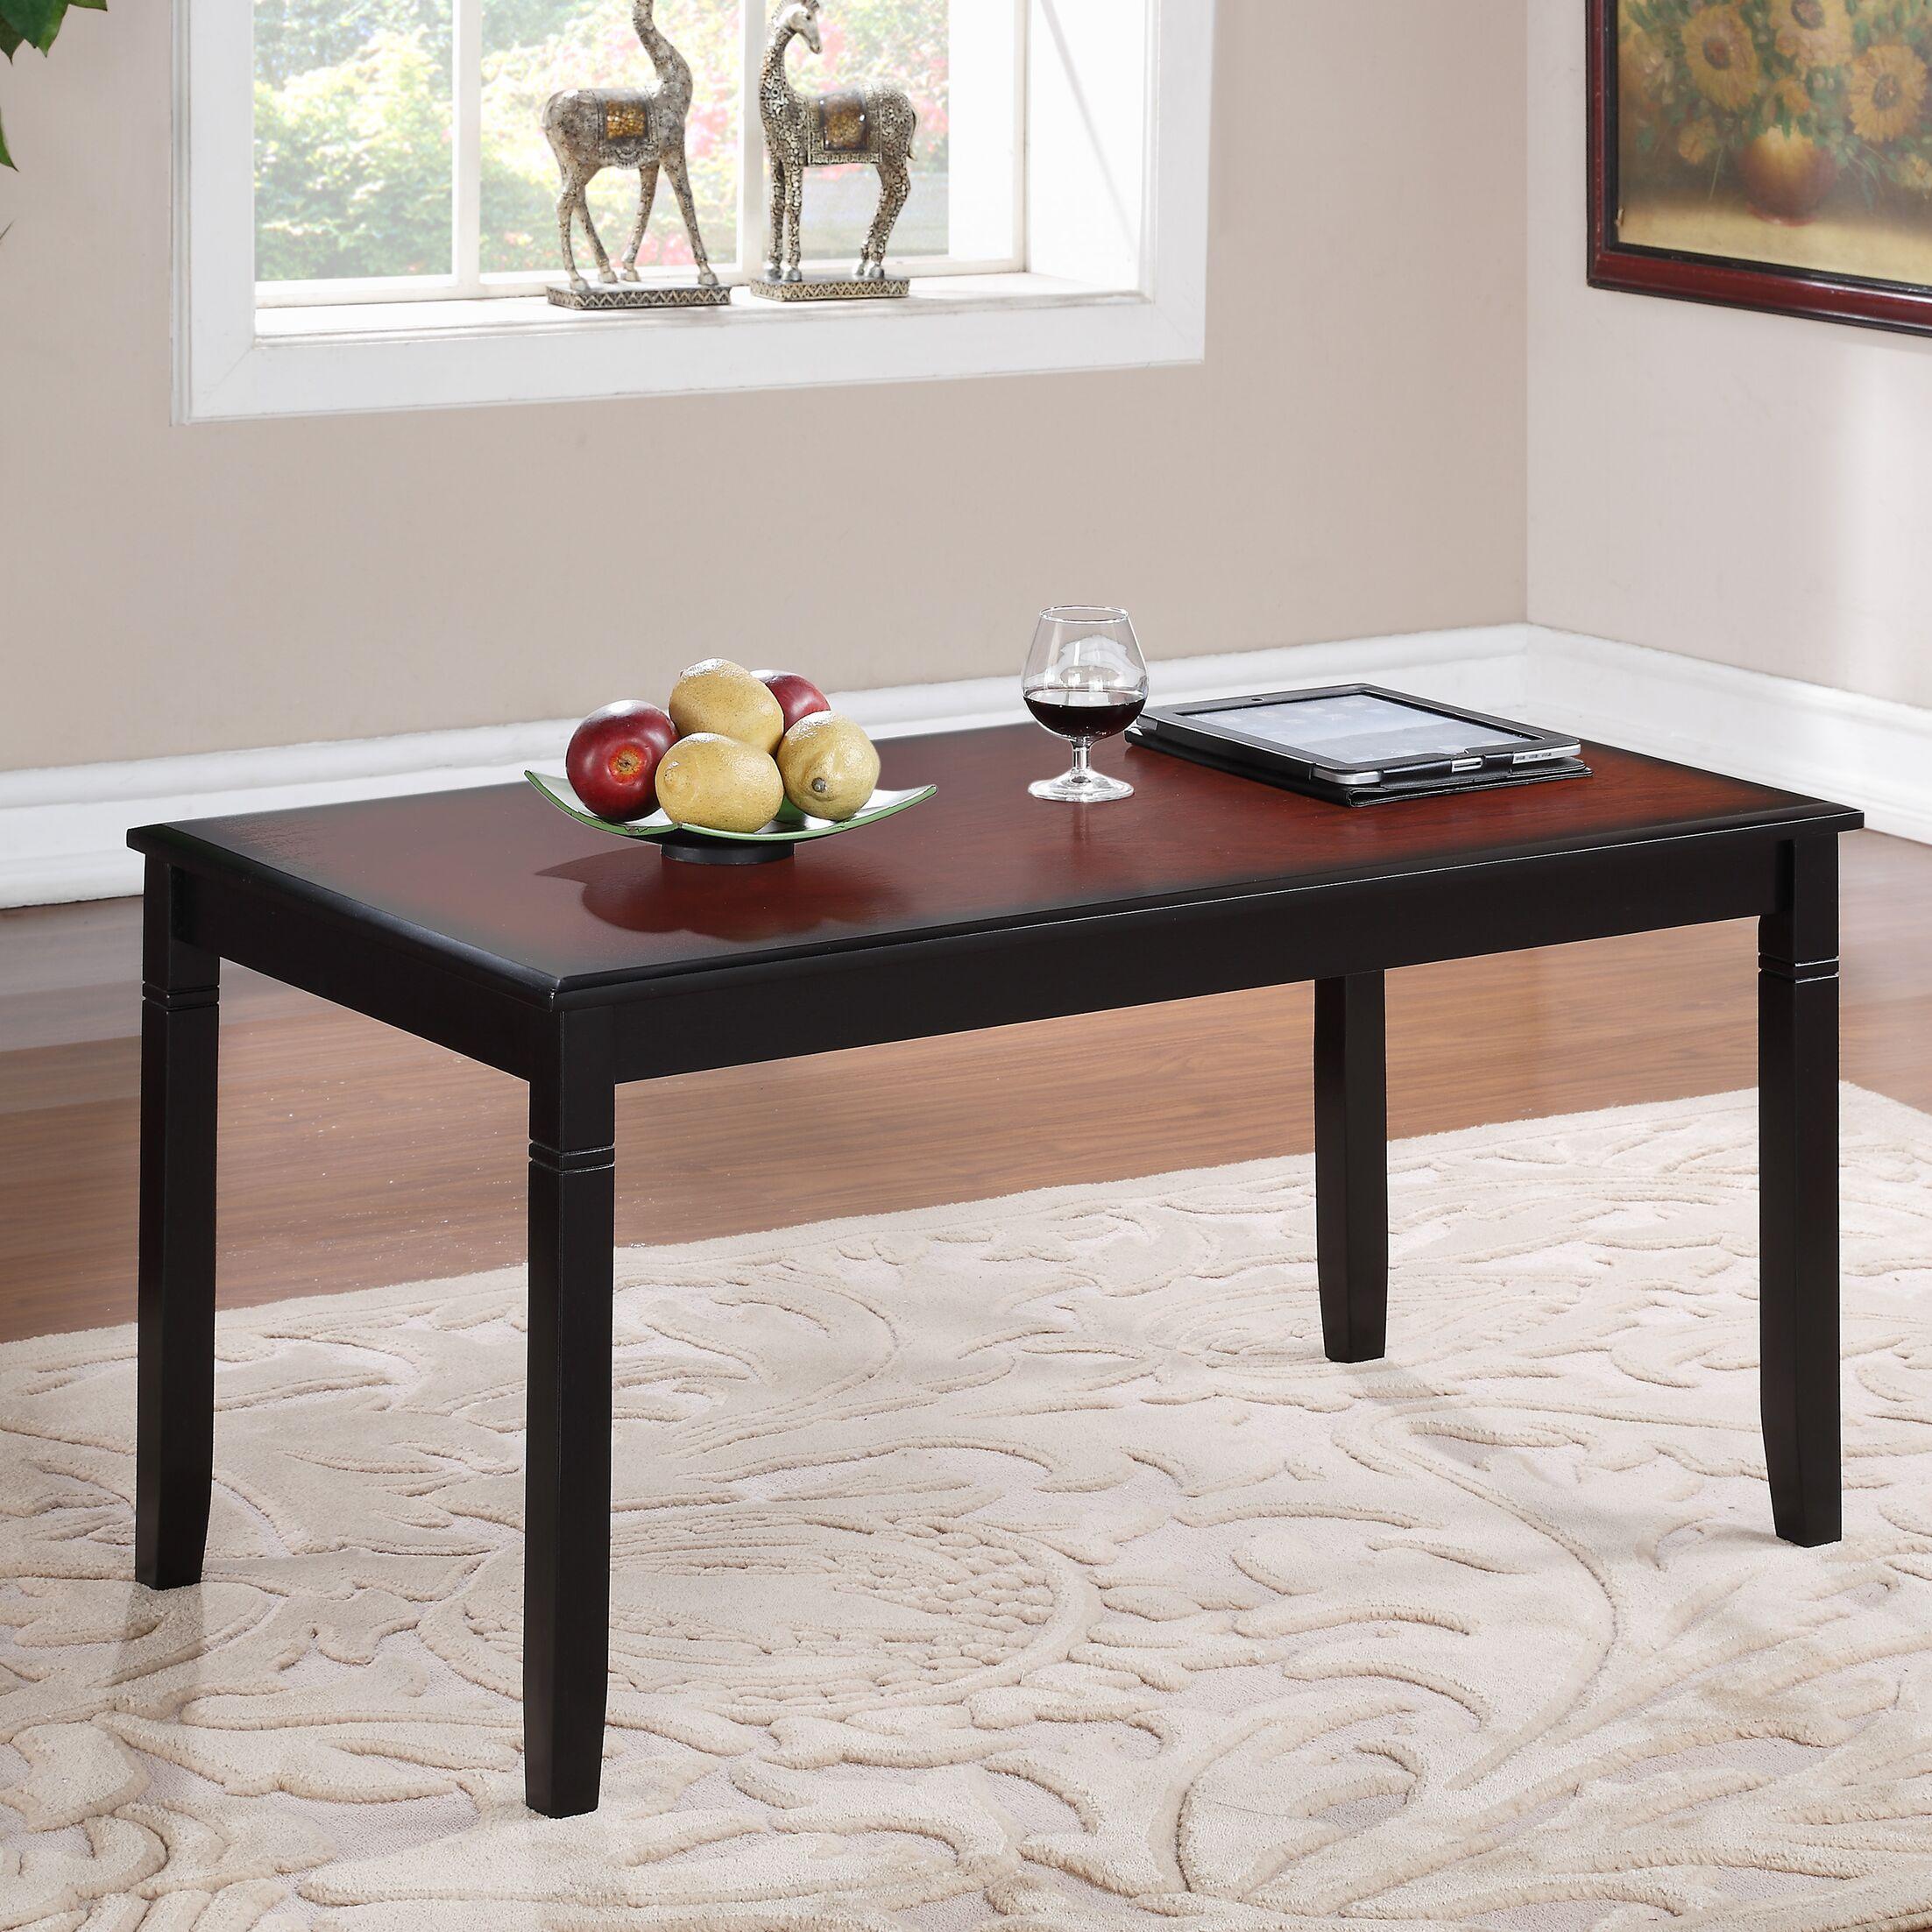 Hilbert Coffee Table